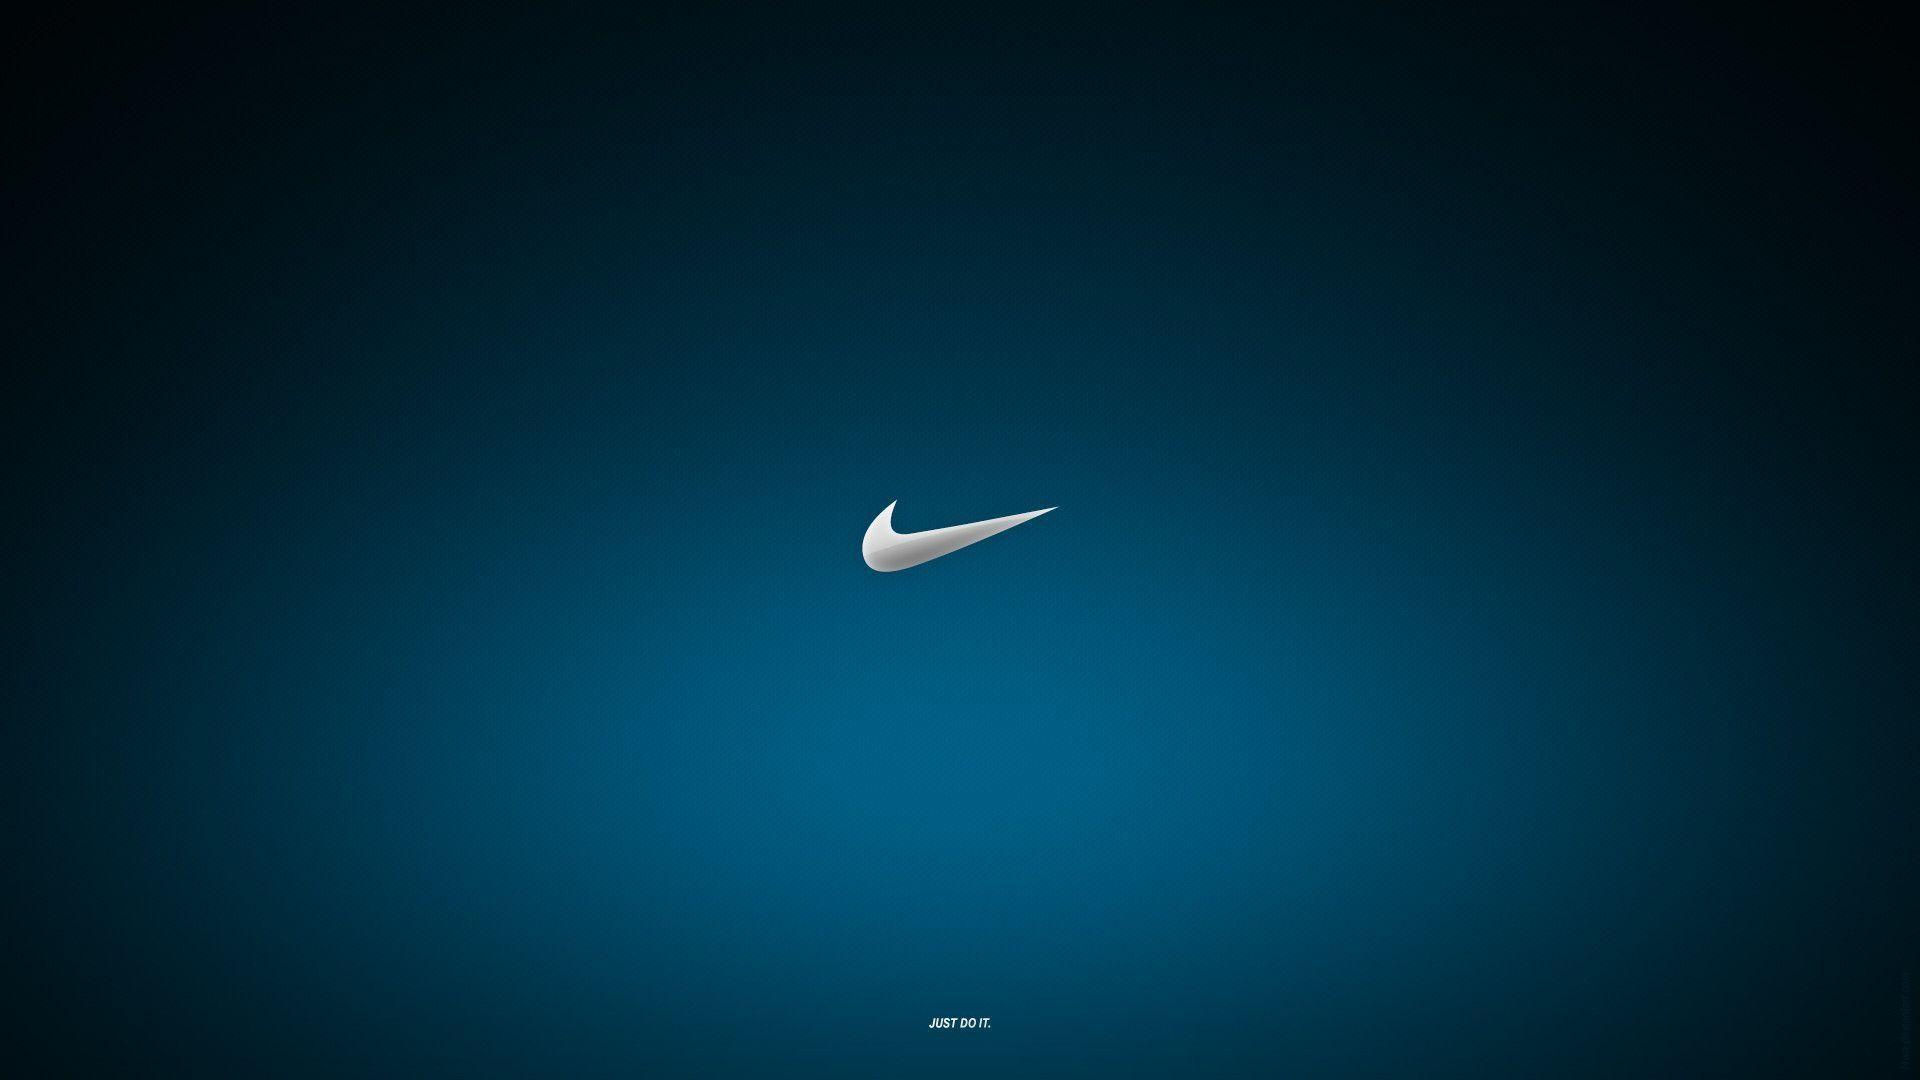 nike football logo wallpaper 70 images